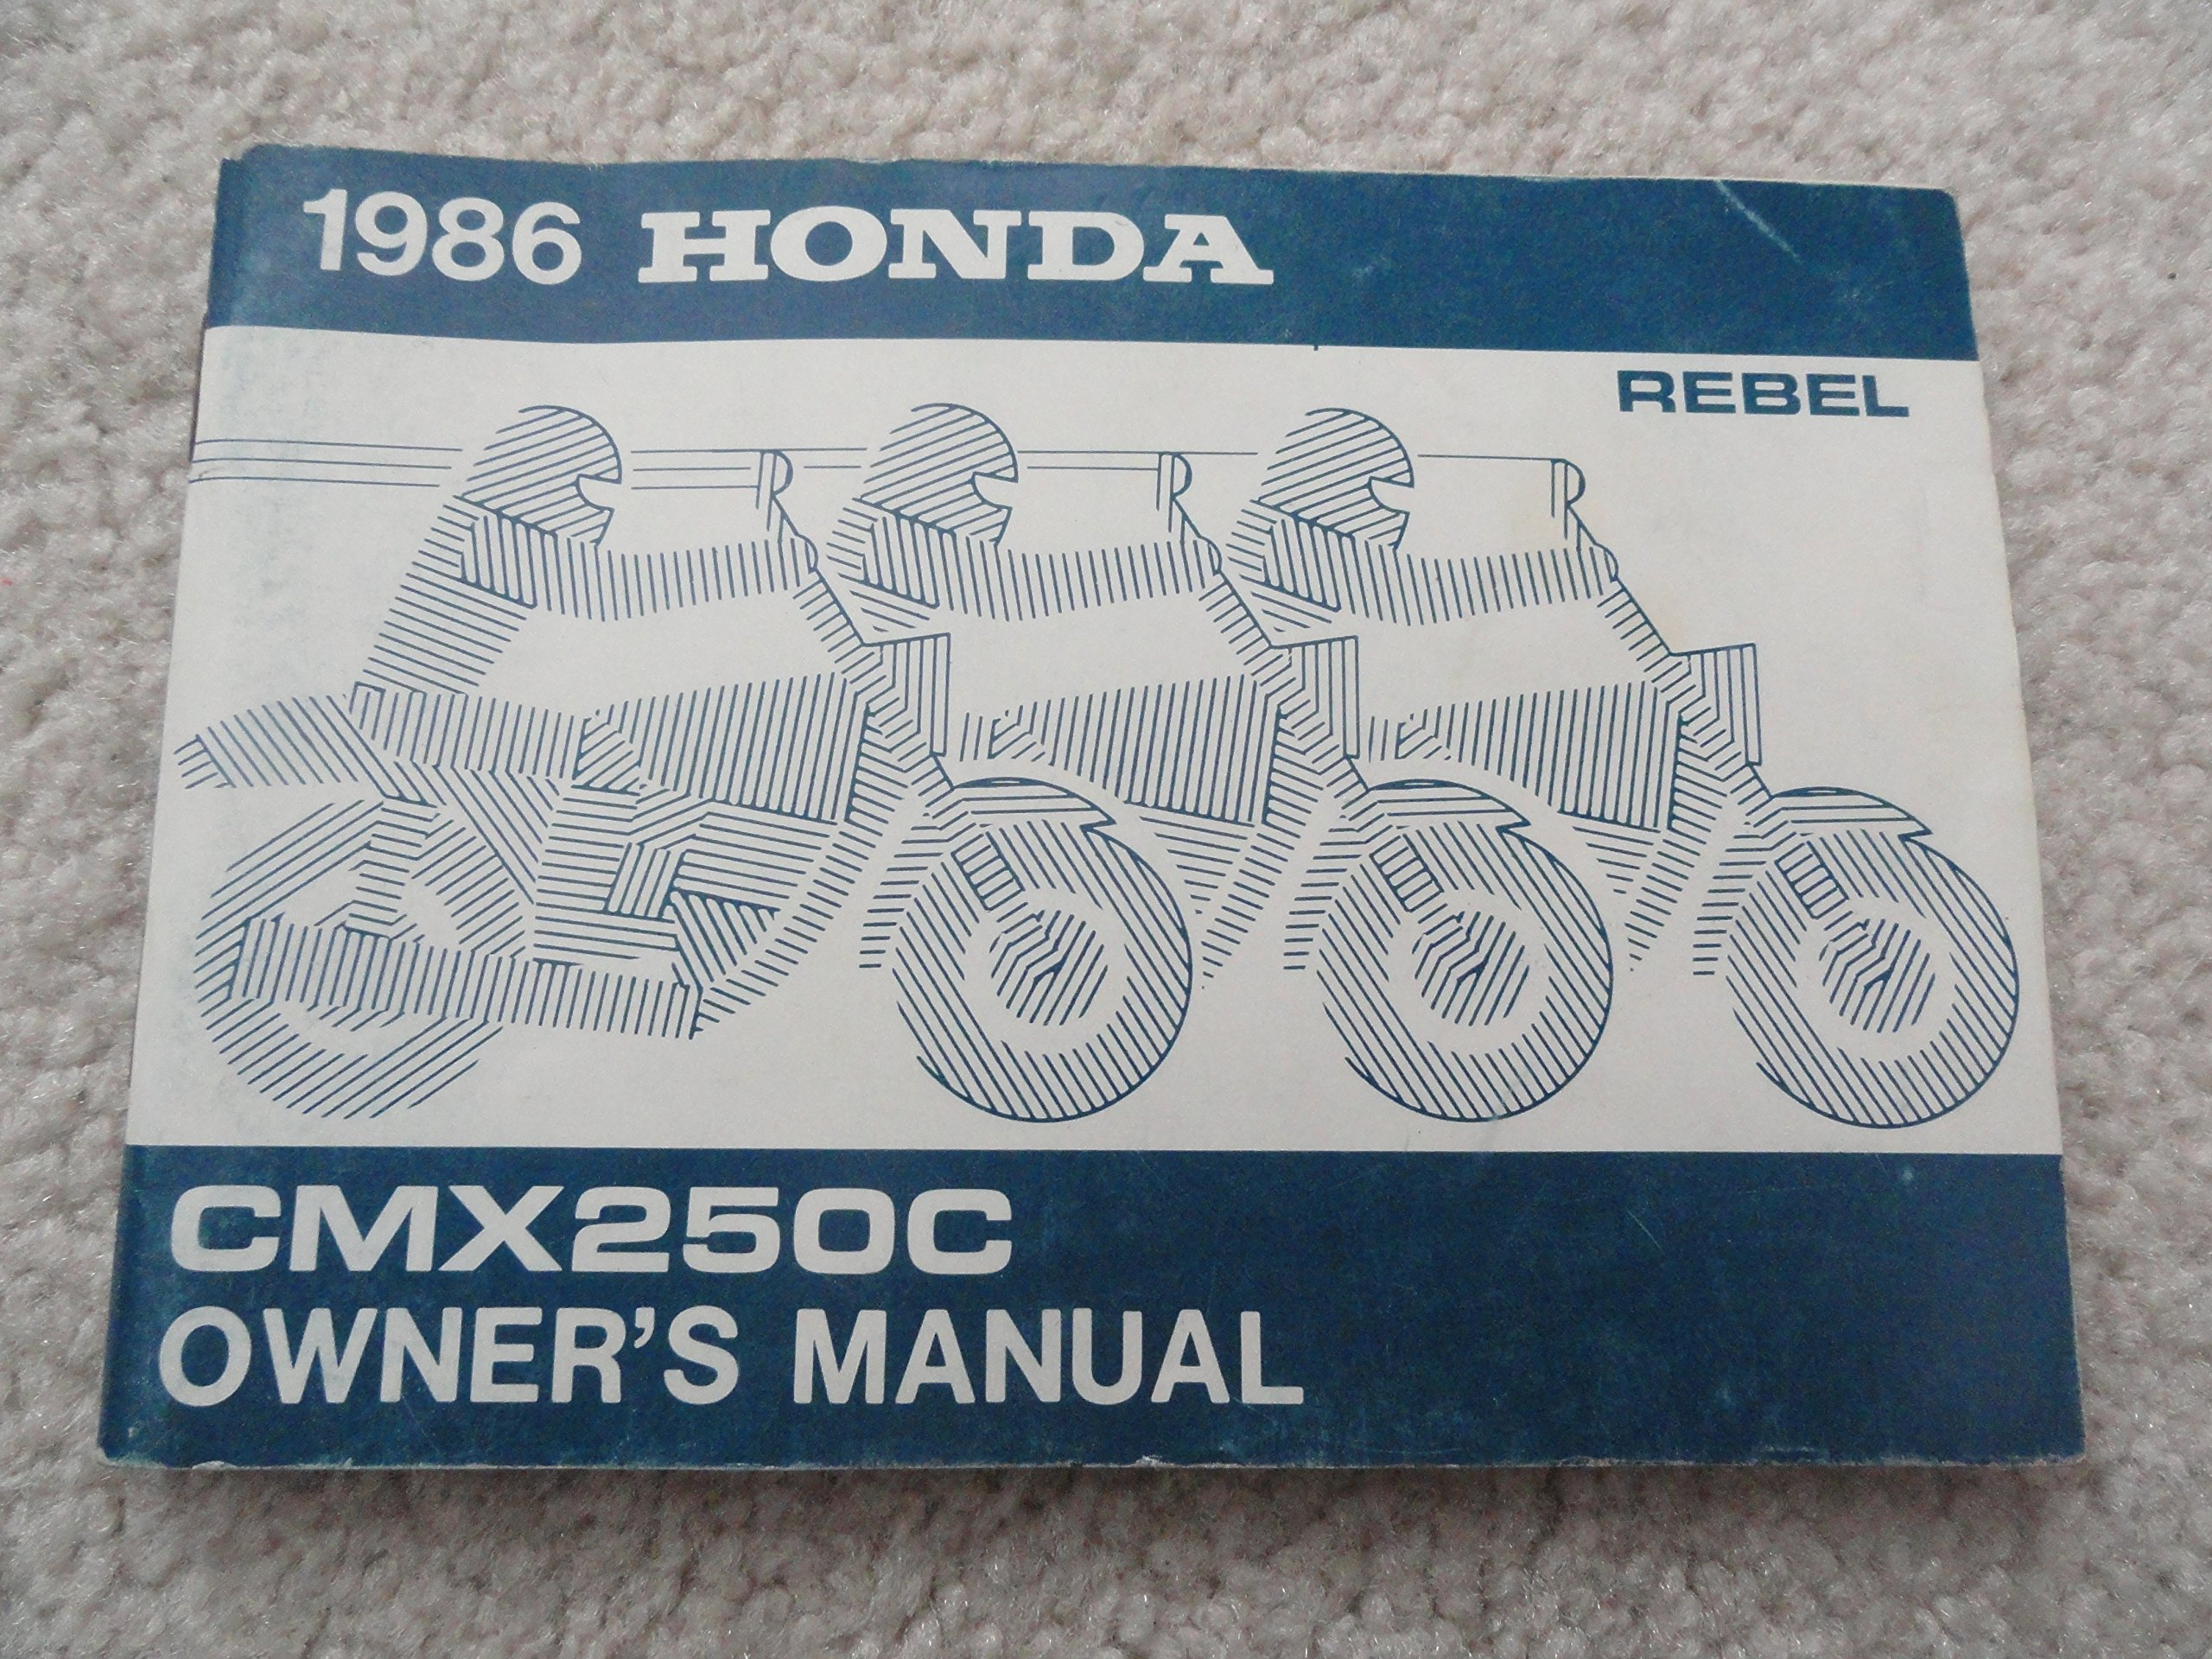 1986 honda cmx250c rebel owners manual cmx 250 c honda amazon com rh amazon com 2012 Honda Rebel 450 2009 Honda Rebel 450